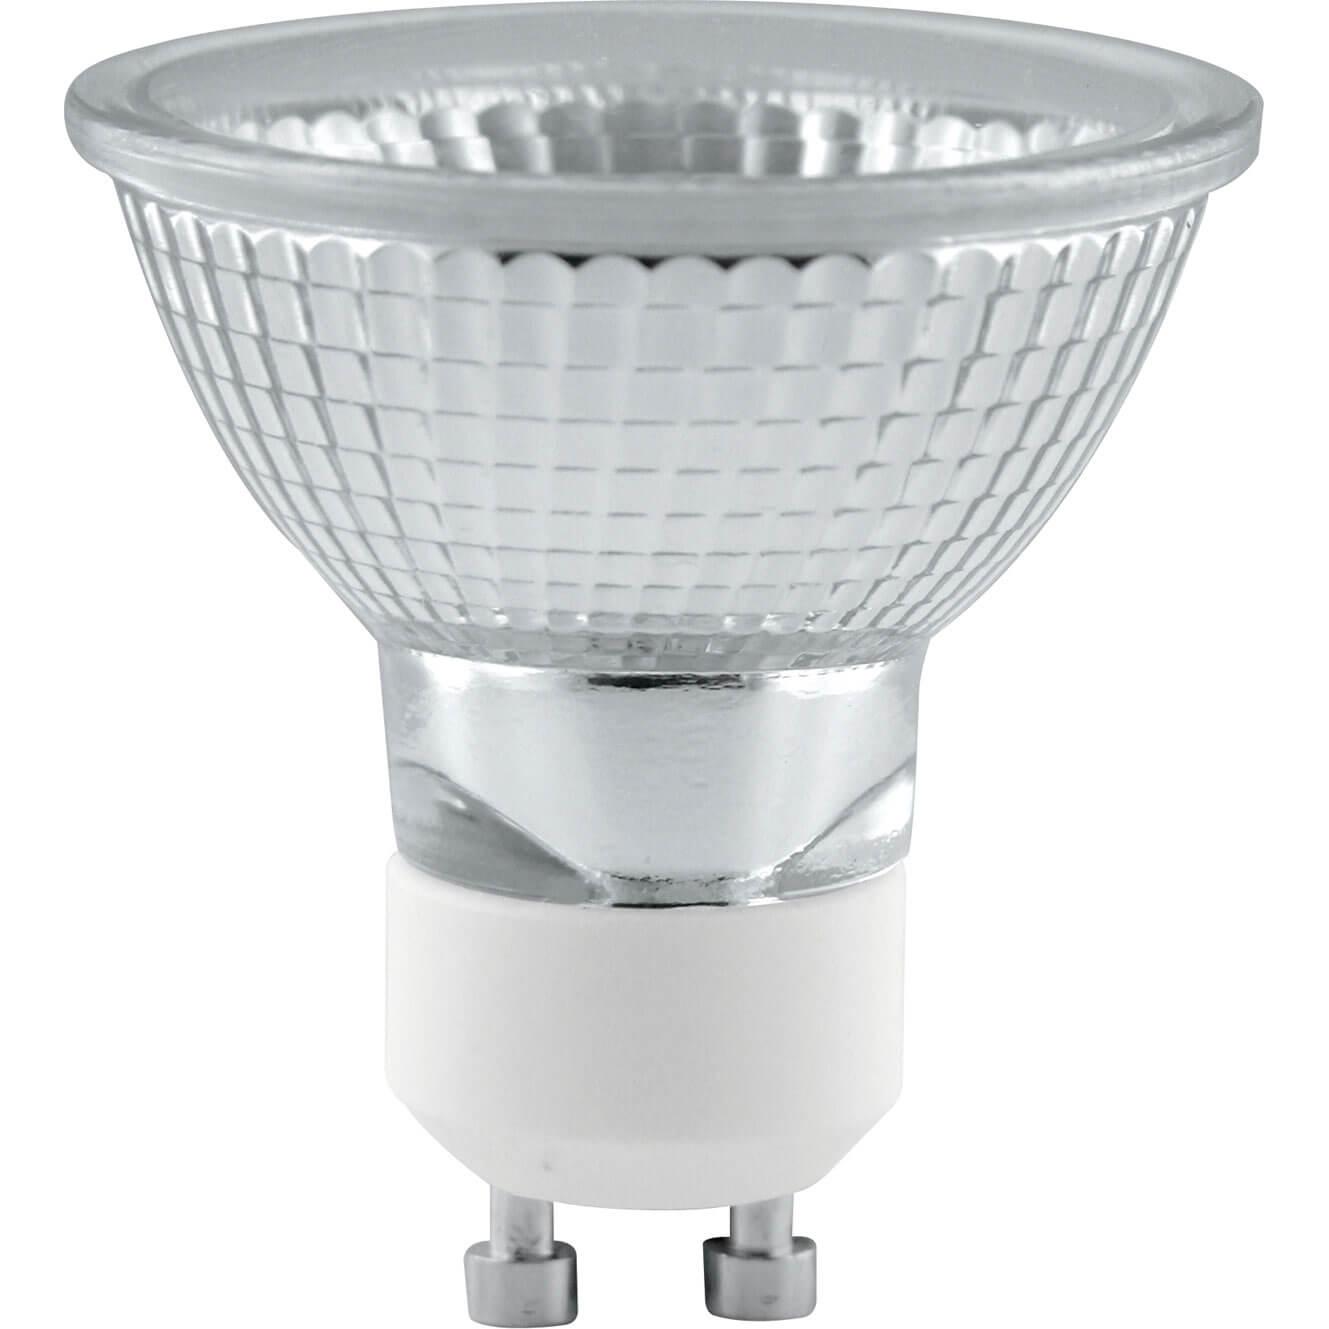 Eveready Energy Save GU10 Halogen Bulb 40w 240v